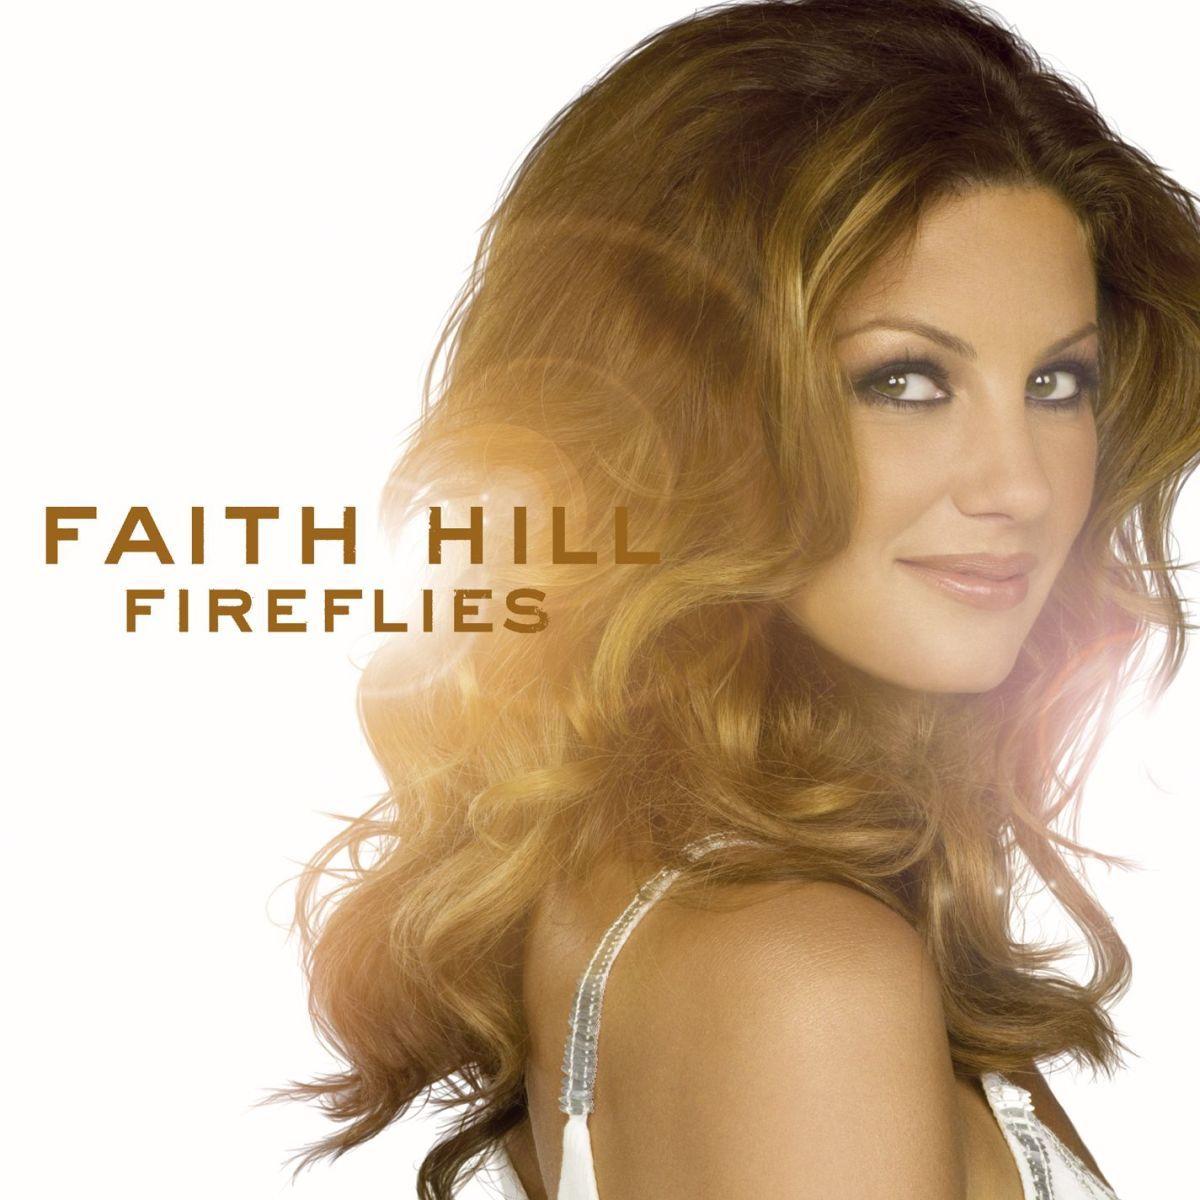 Faith Hill - Fireflies Album Cover